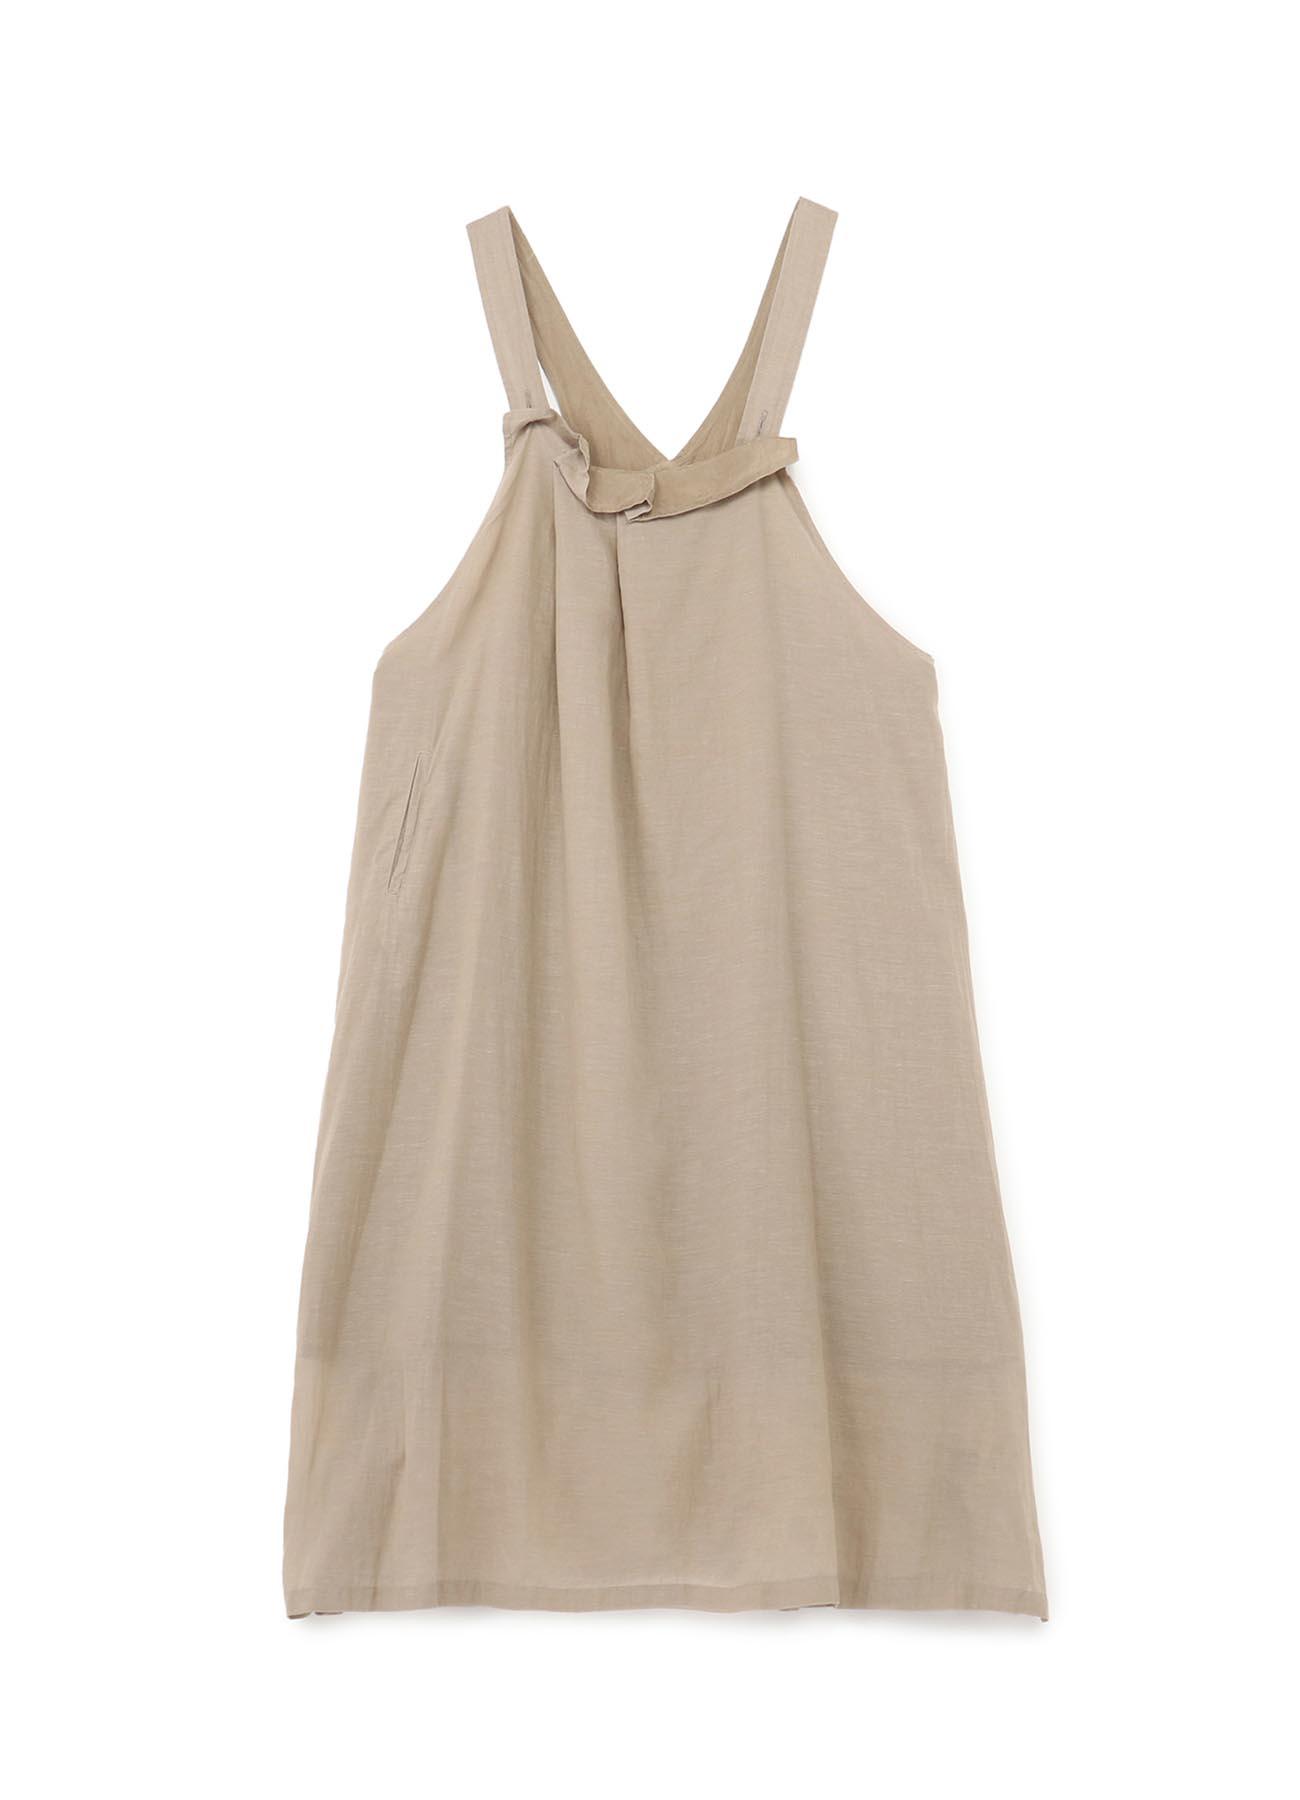 Cu/C/F BOYLE RANDOM TUCK DRESS